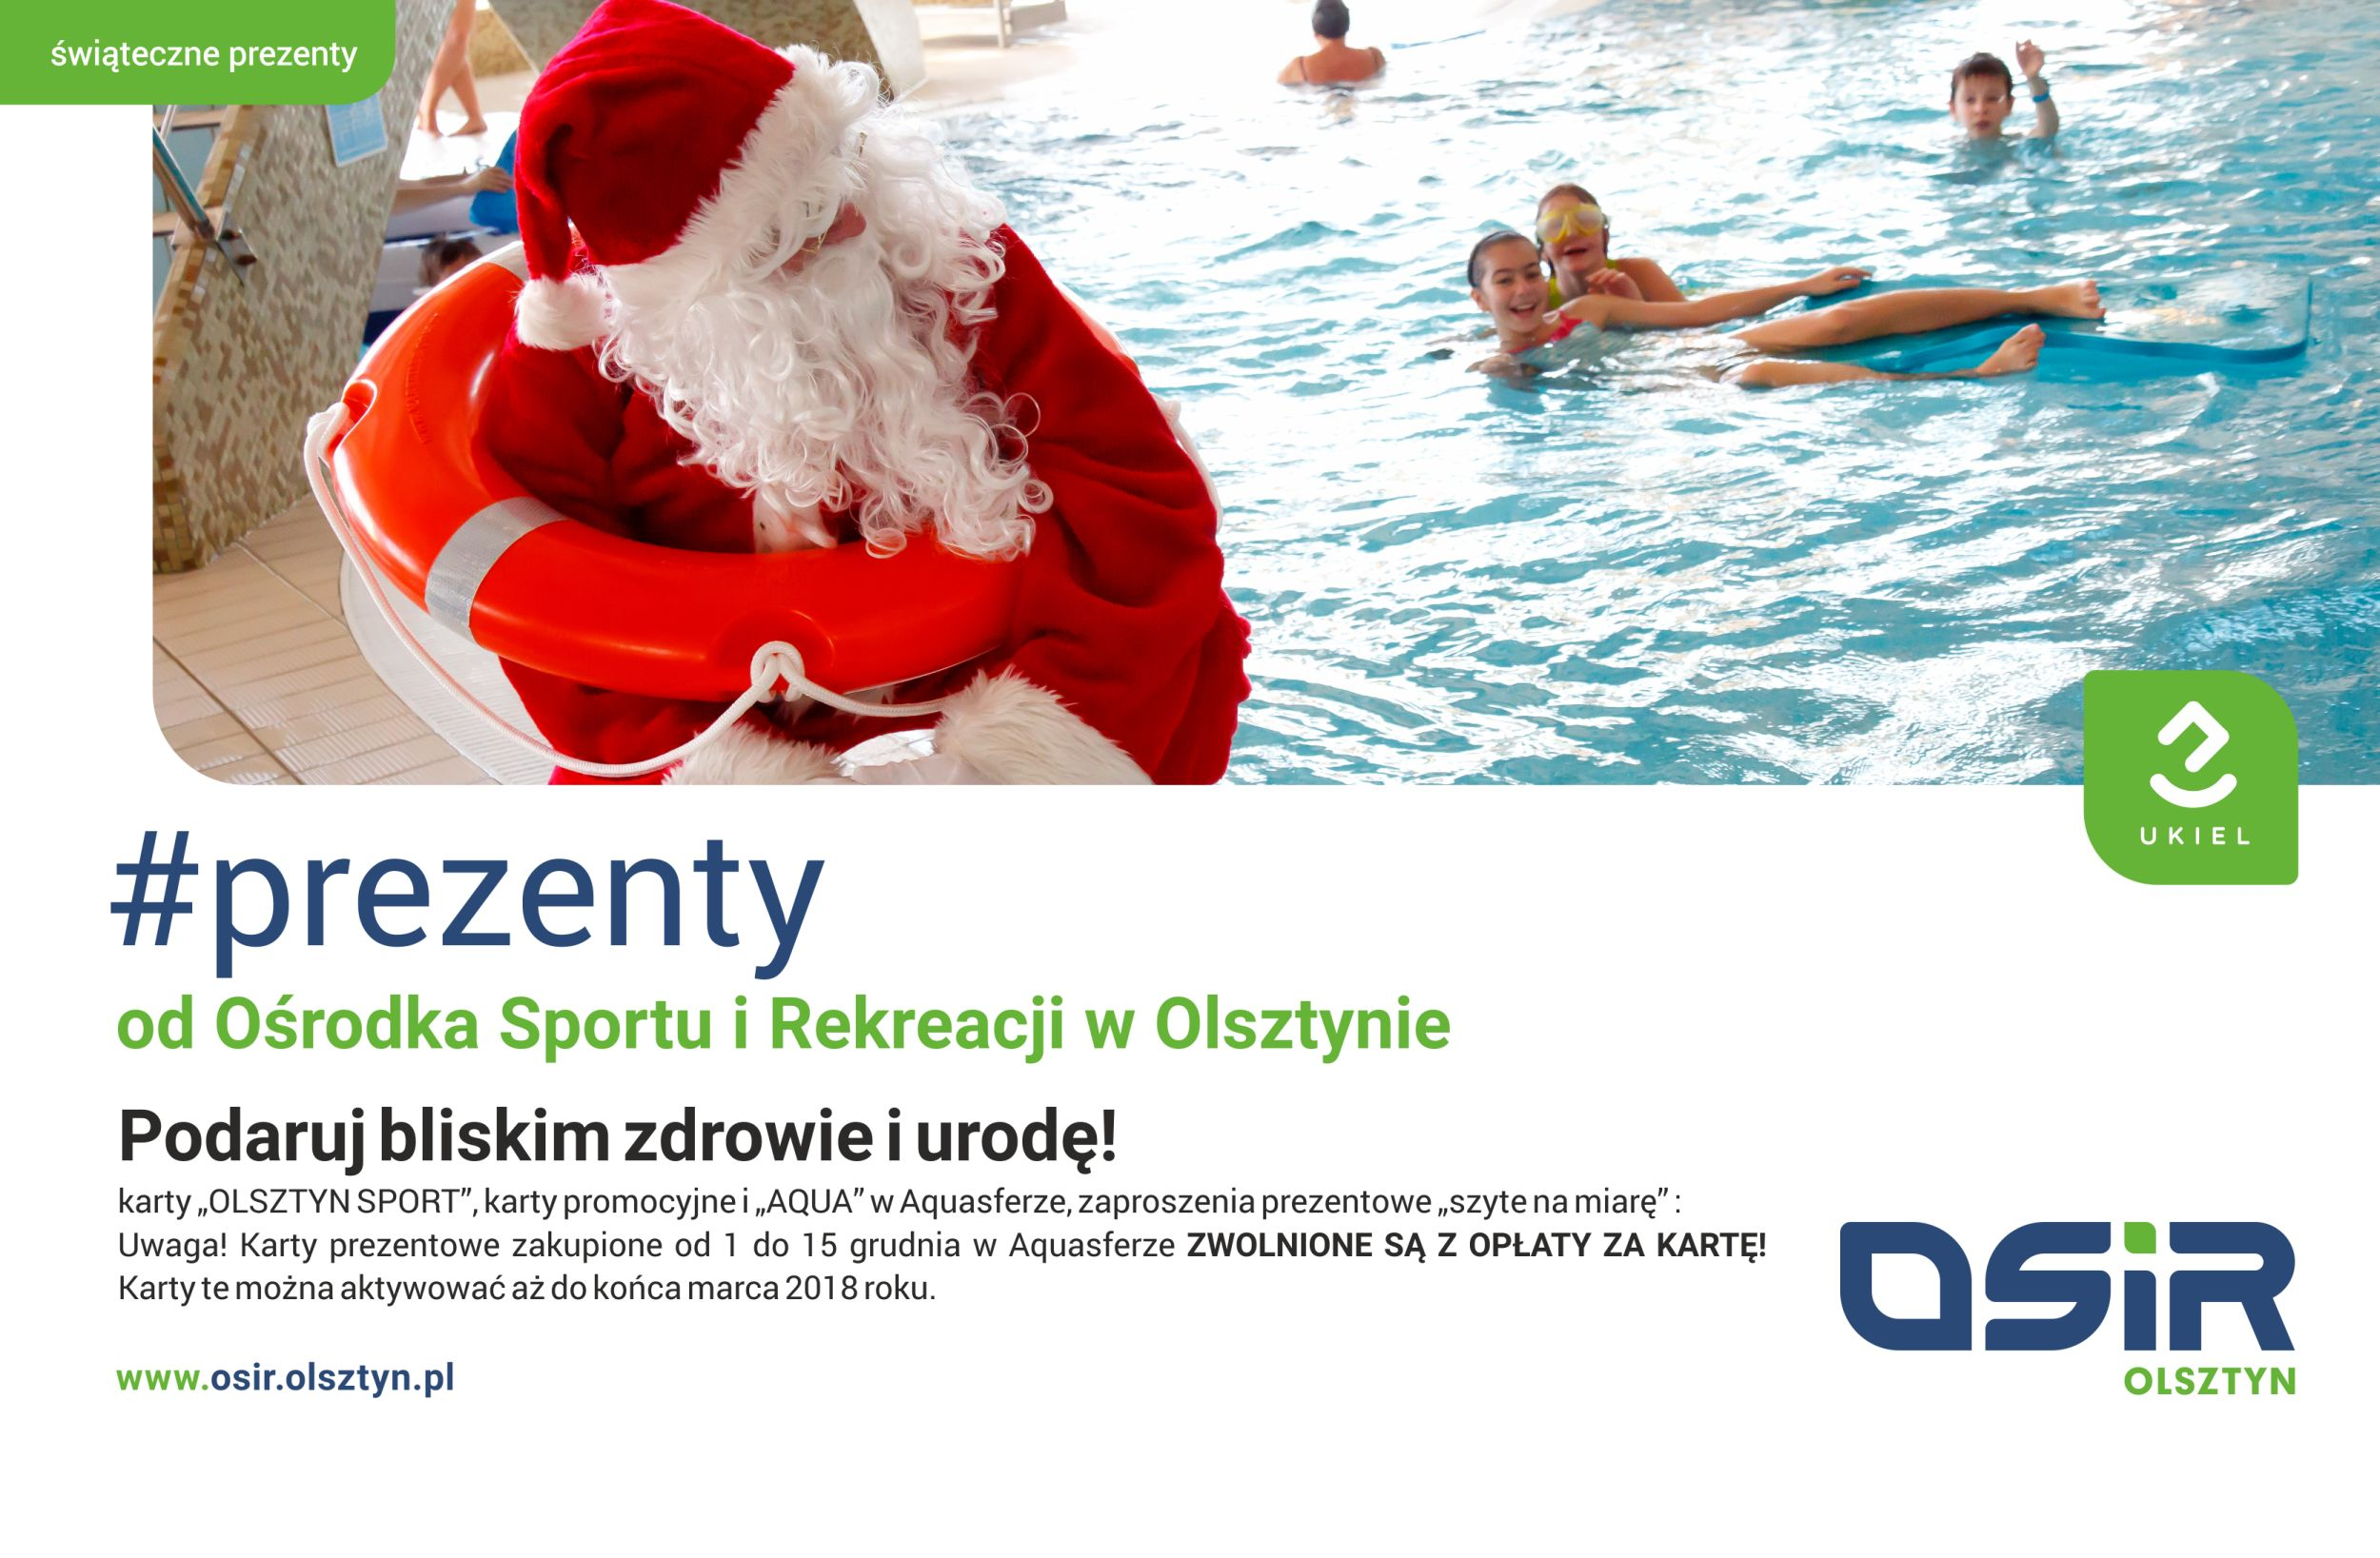 http://m.wm.pl/2017/12/orig/planszetv-mikolaj-433157.jpg